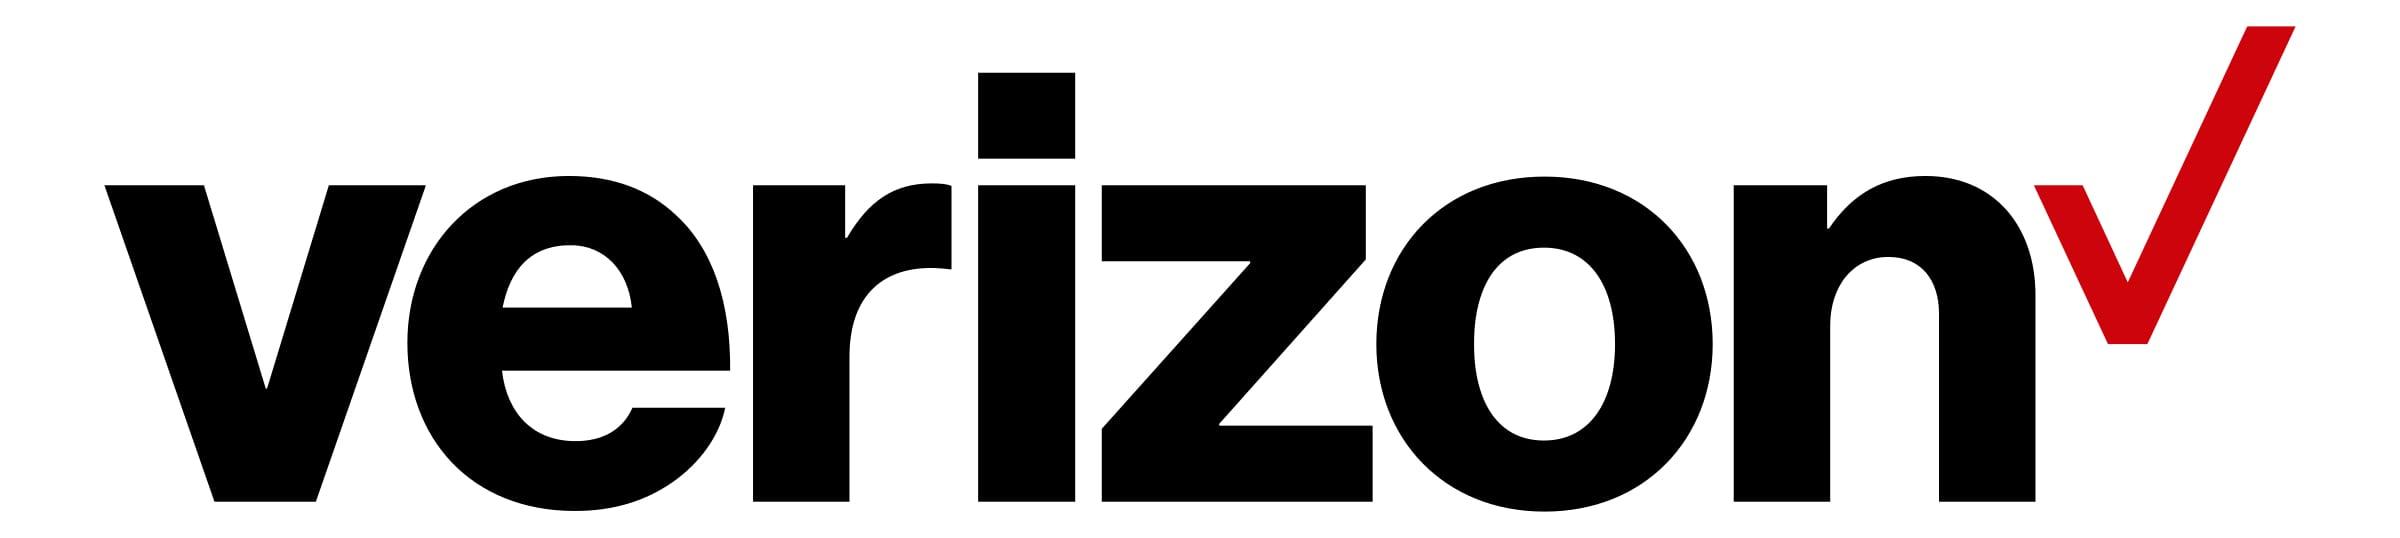 (Verizon logo) Company name in black print: VERIZON, followed by red checkmark.